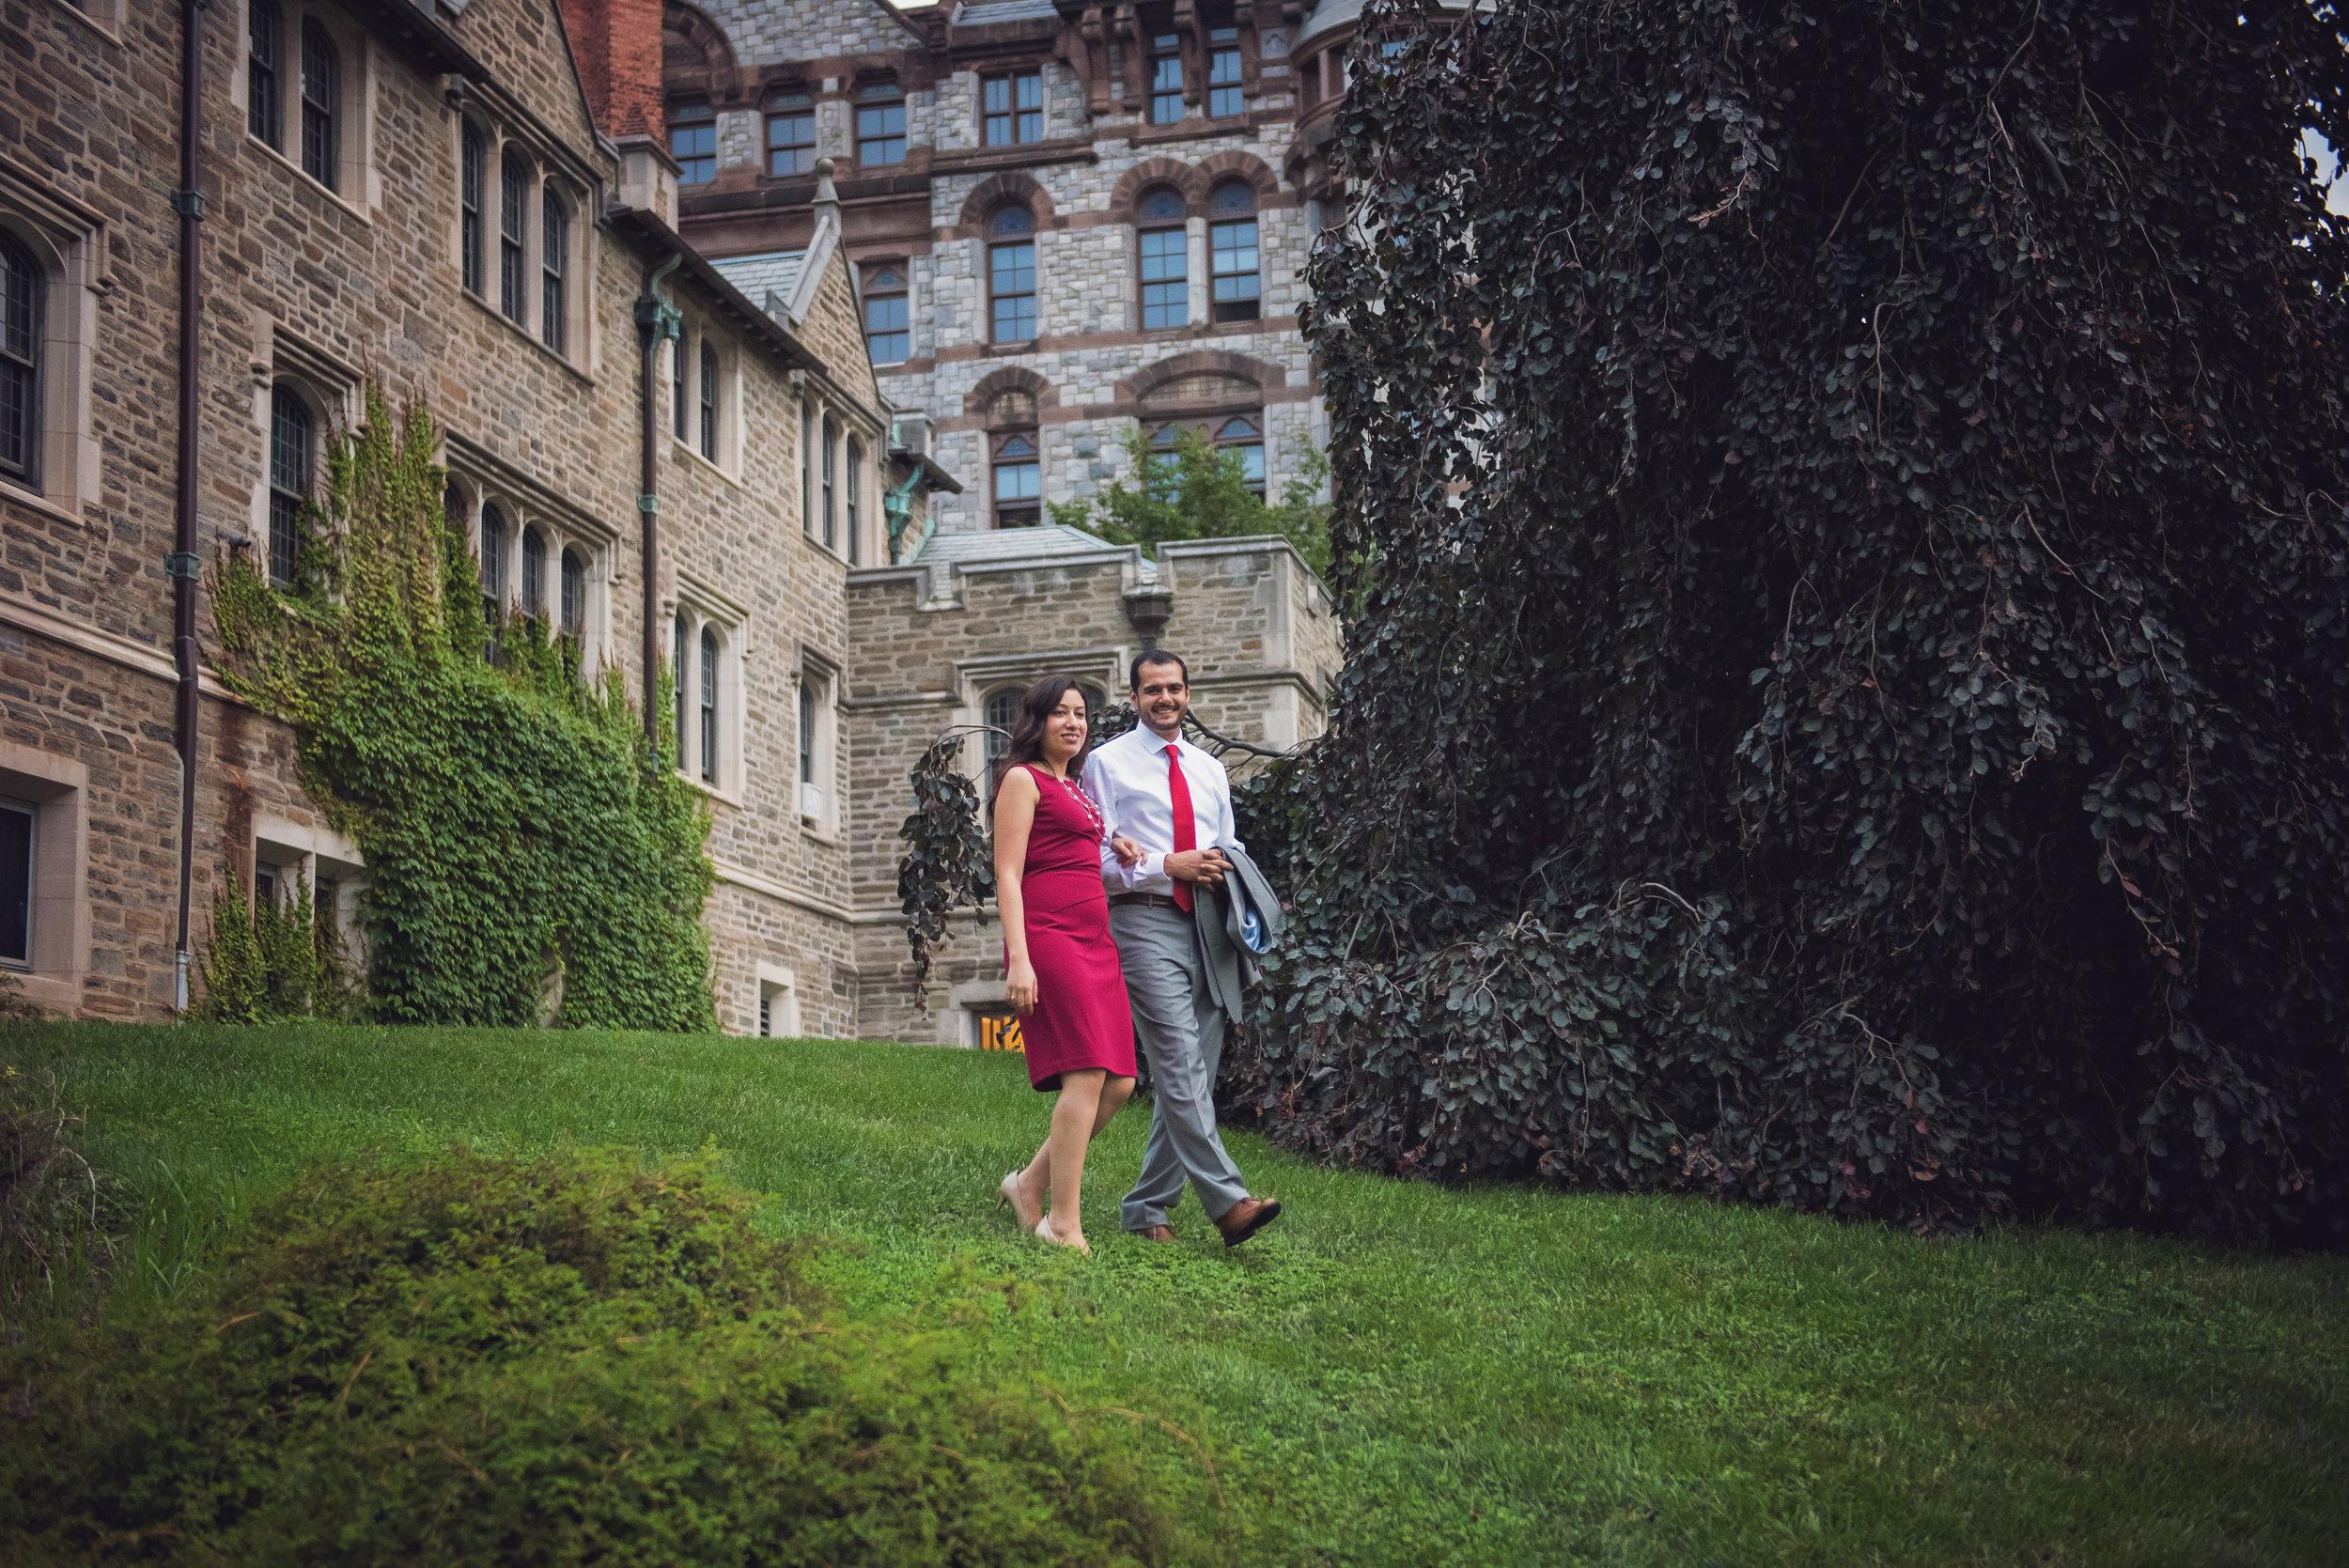 Princeton NJ engagement shoot-17.jpg